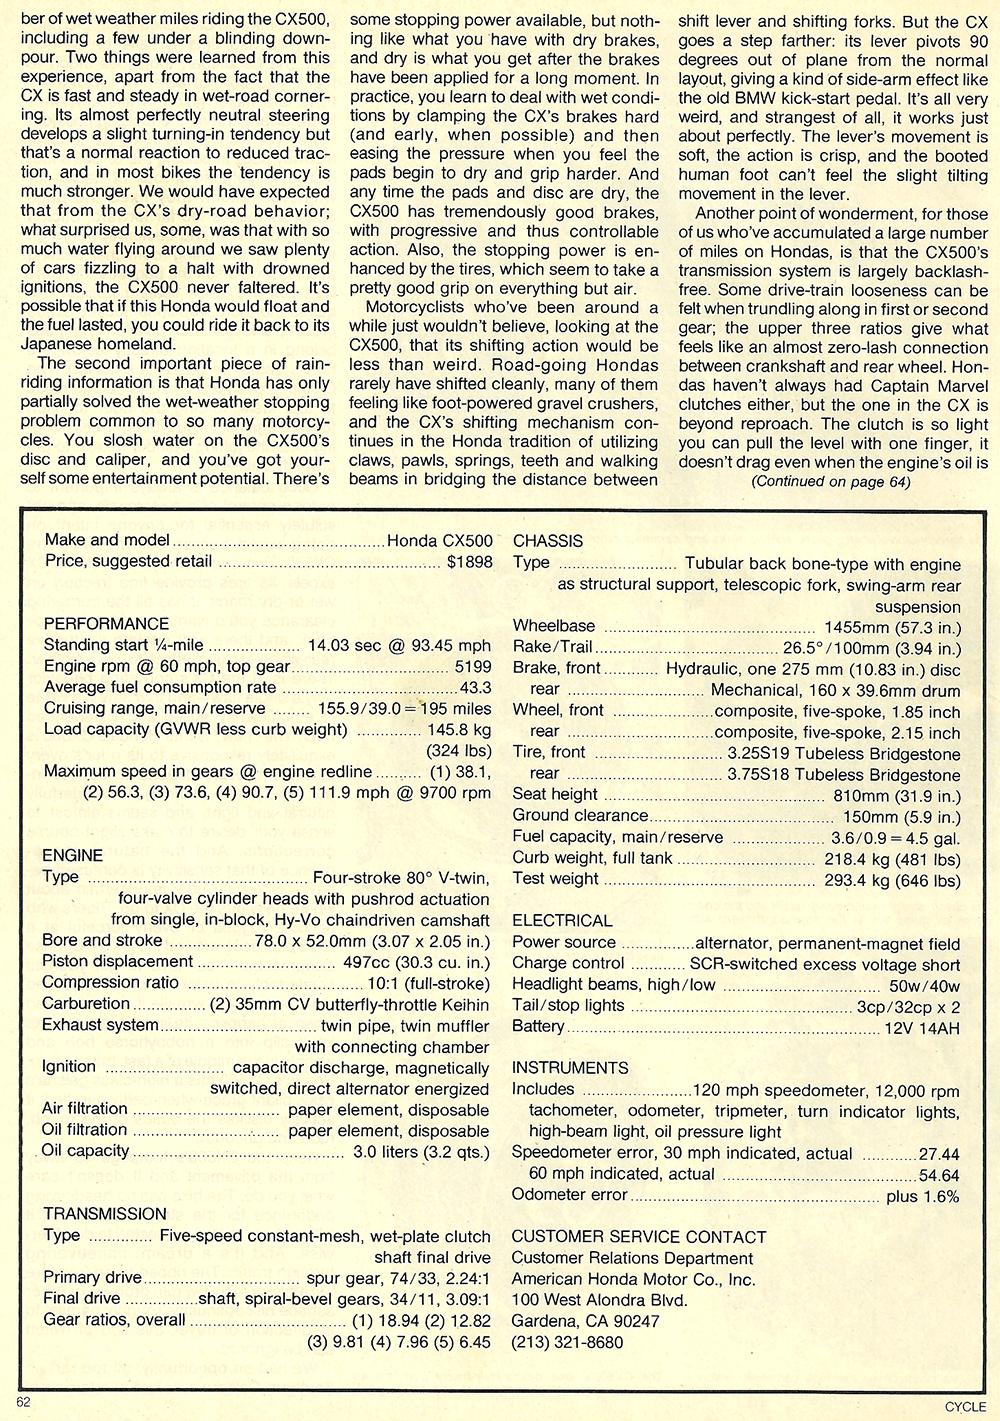 1978 Honda CX500 road test 07.jpg